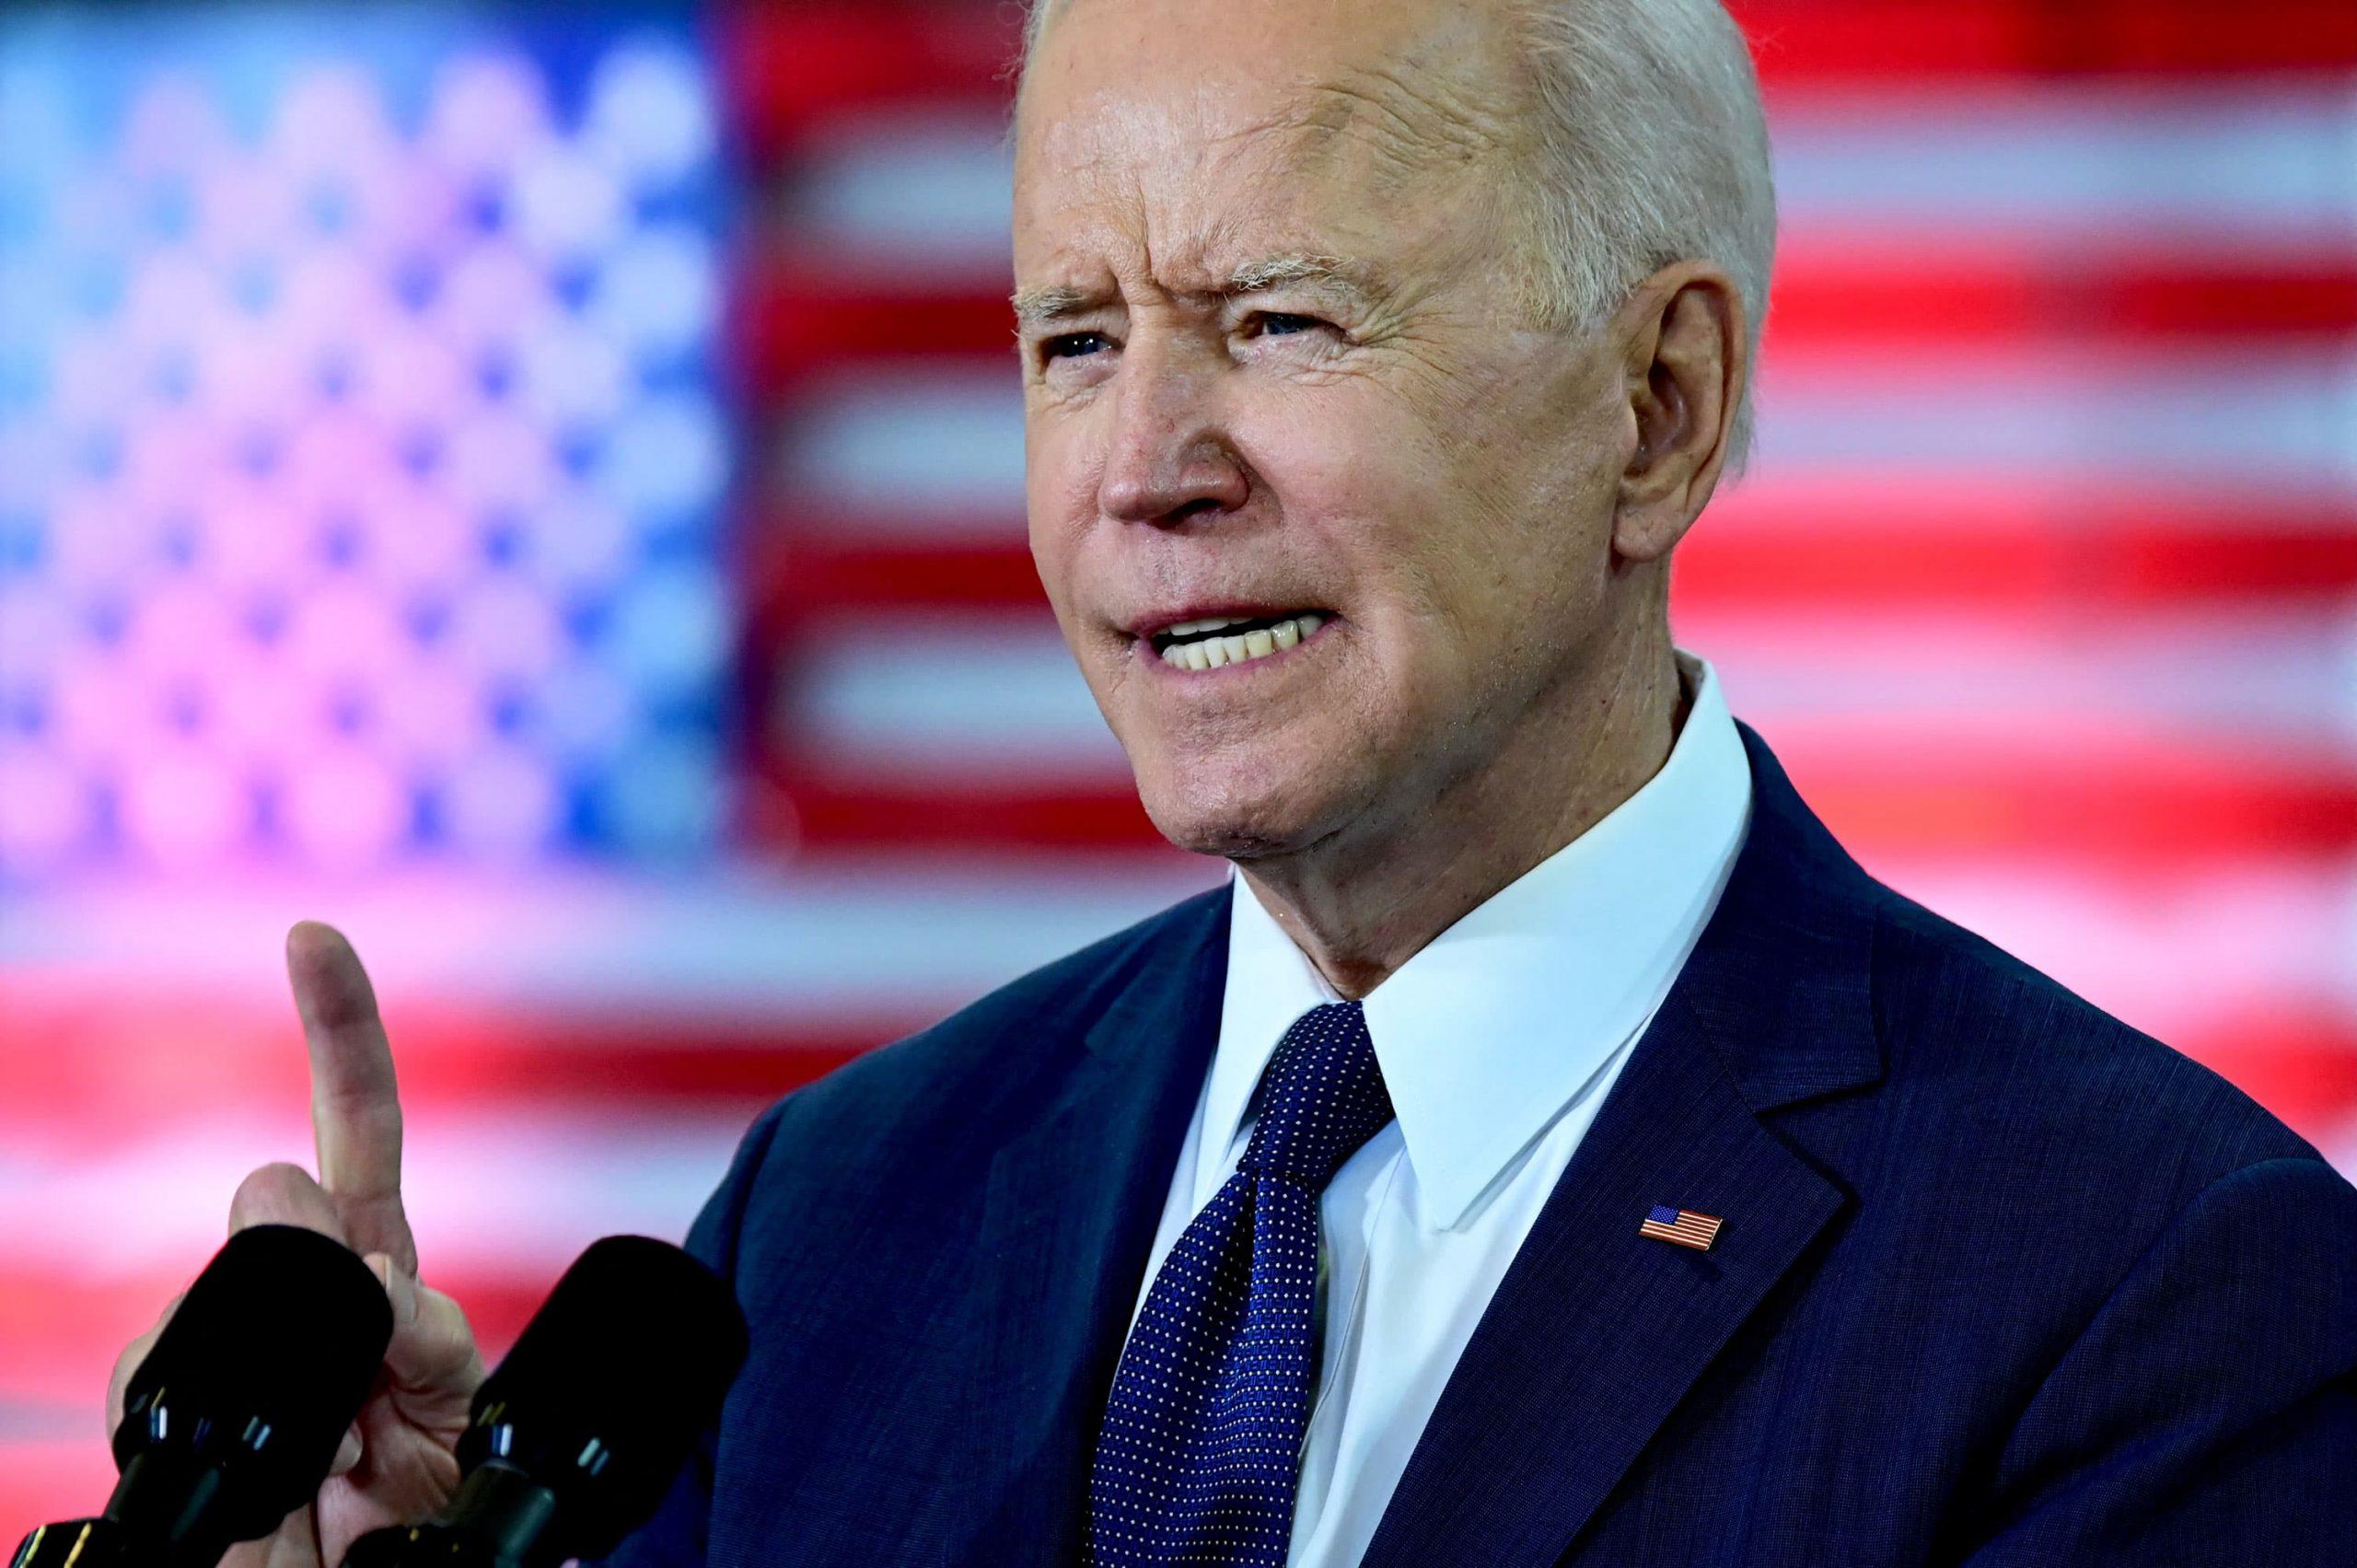 Biden considers health care public option in economic recovery plan